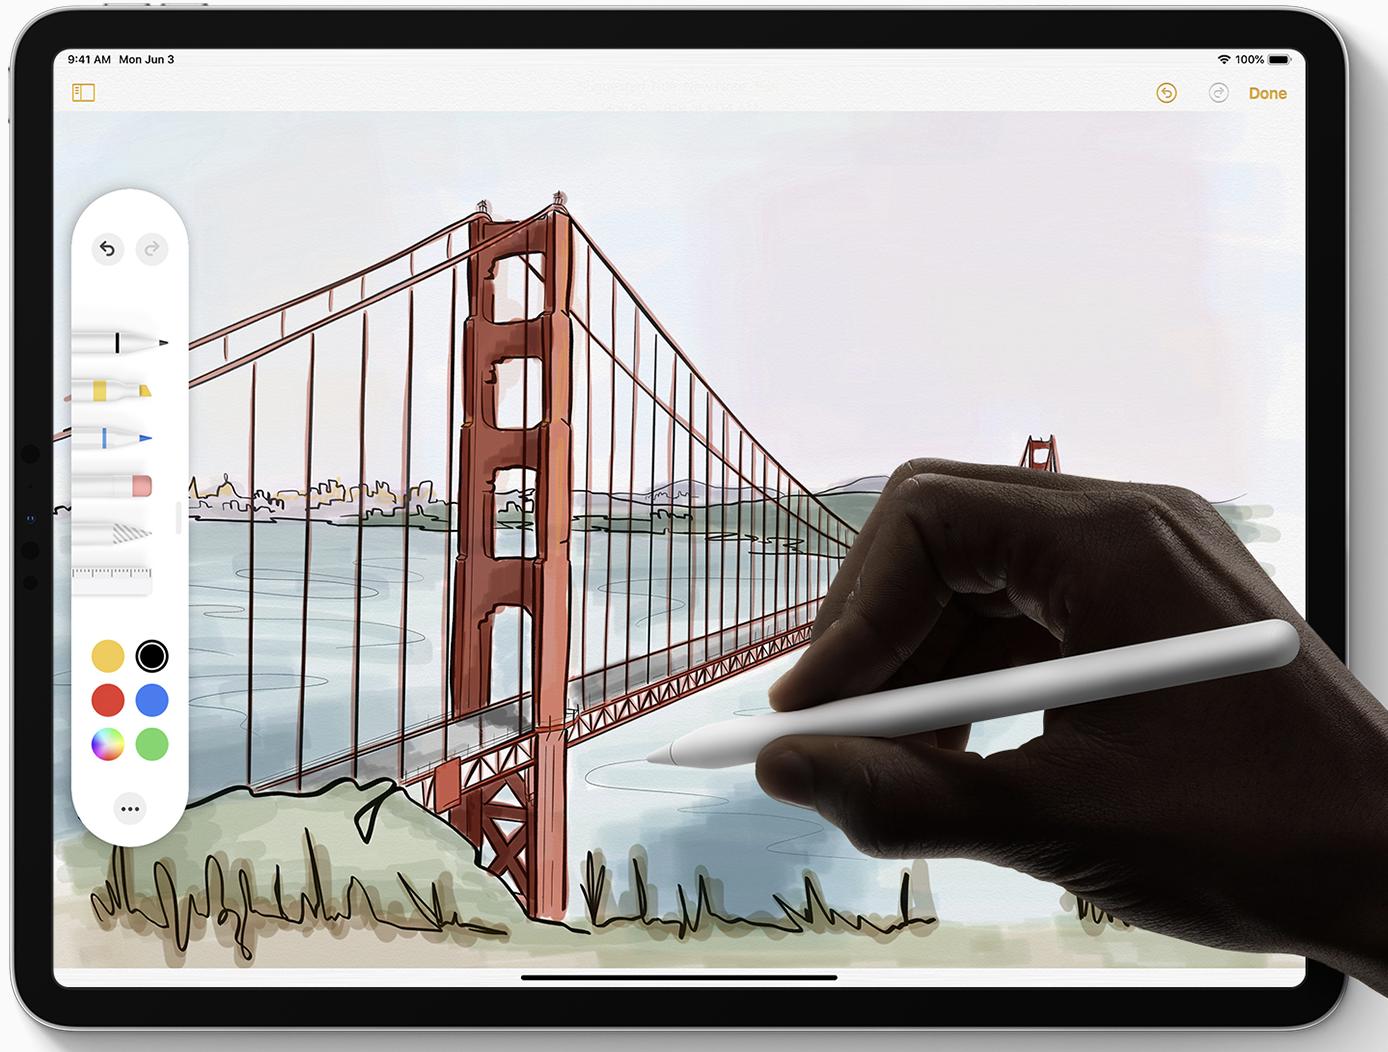 iOS 13.6, iPadOS 13.6, tvOS 13.5, watchOS 6.2.9 released